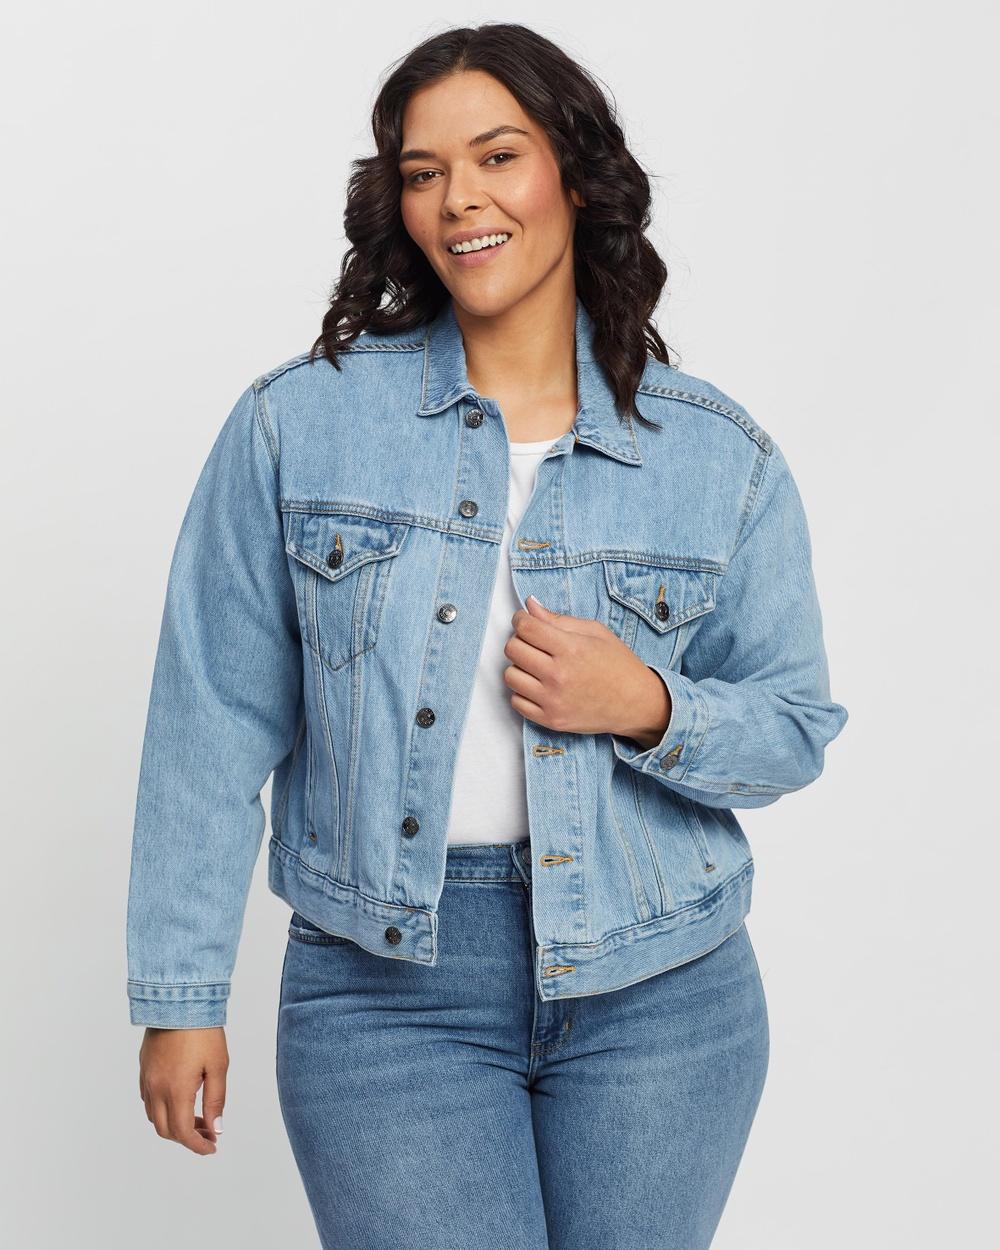 Atmos&Here Curvy Jackie Recycled Cotton Blend Denim Jacket jacket Vintage Blue Australia